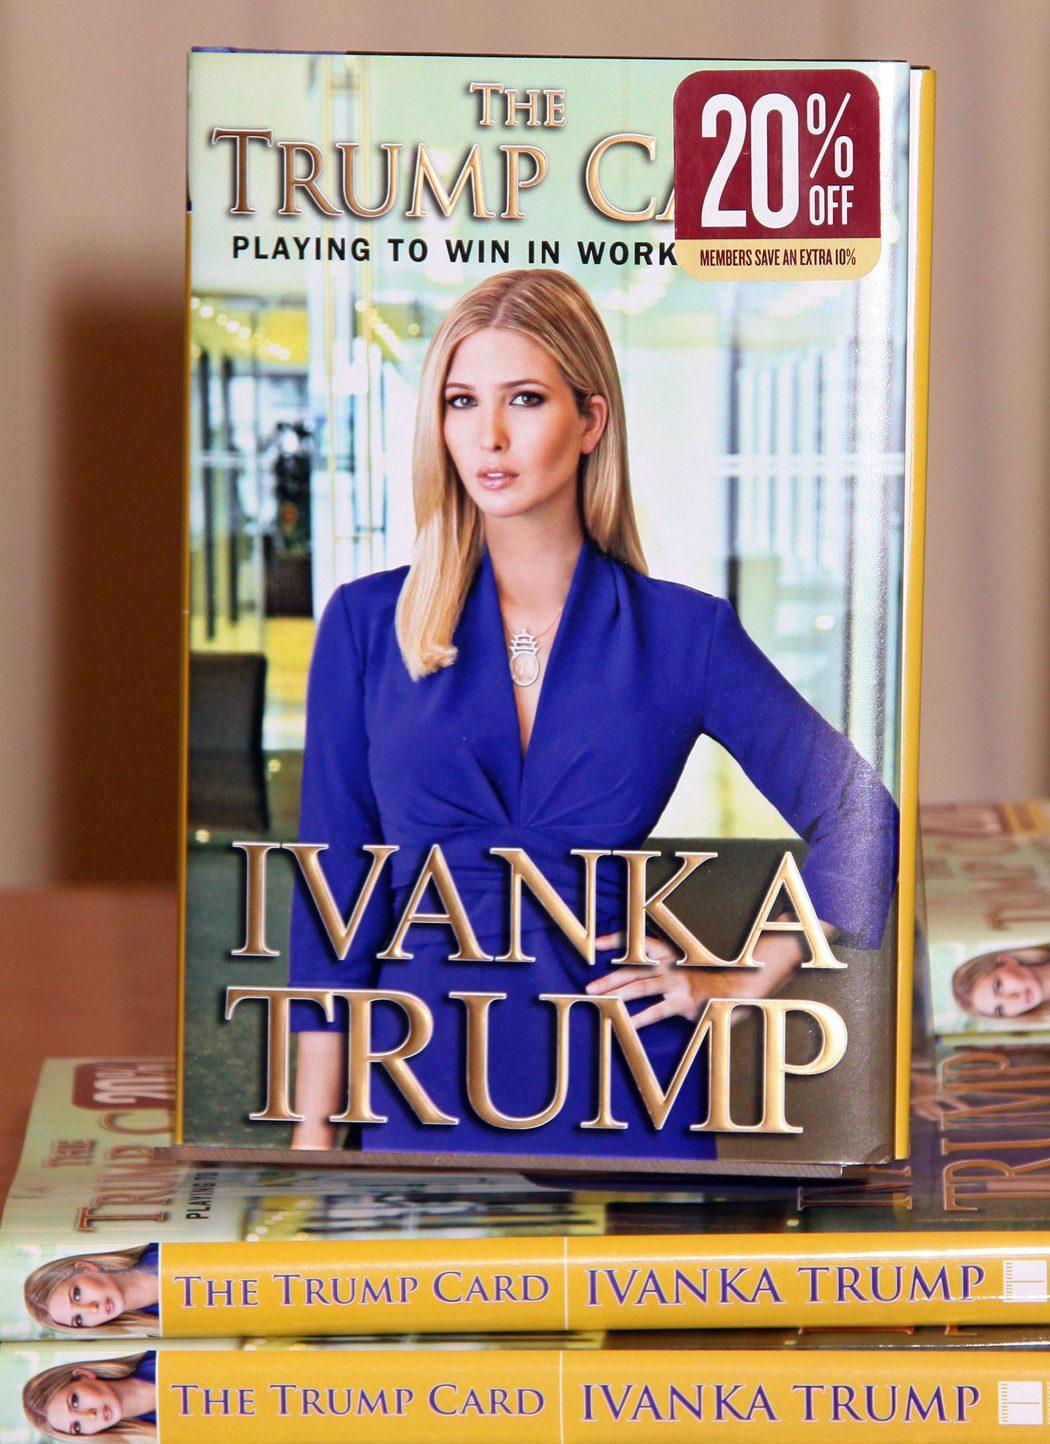 2009-10-cn-ivanka-trump-jewelry3 10 Strangest Ivanka Trump's Brand Facts